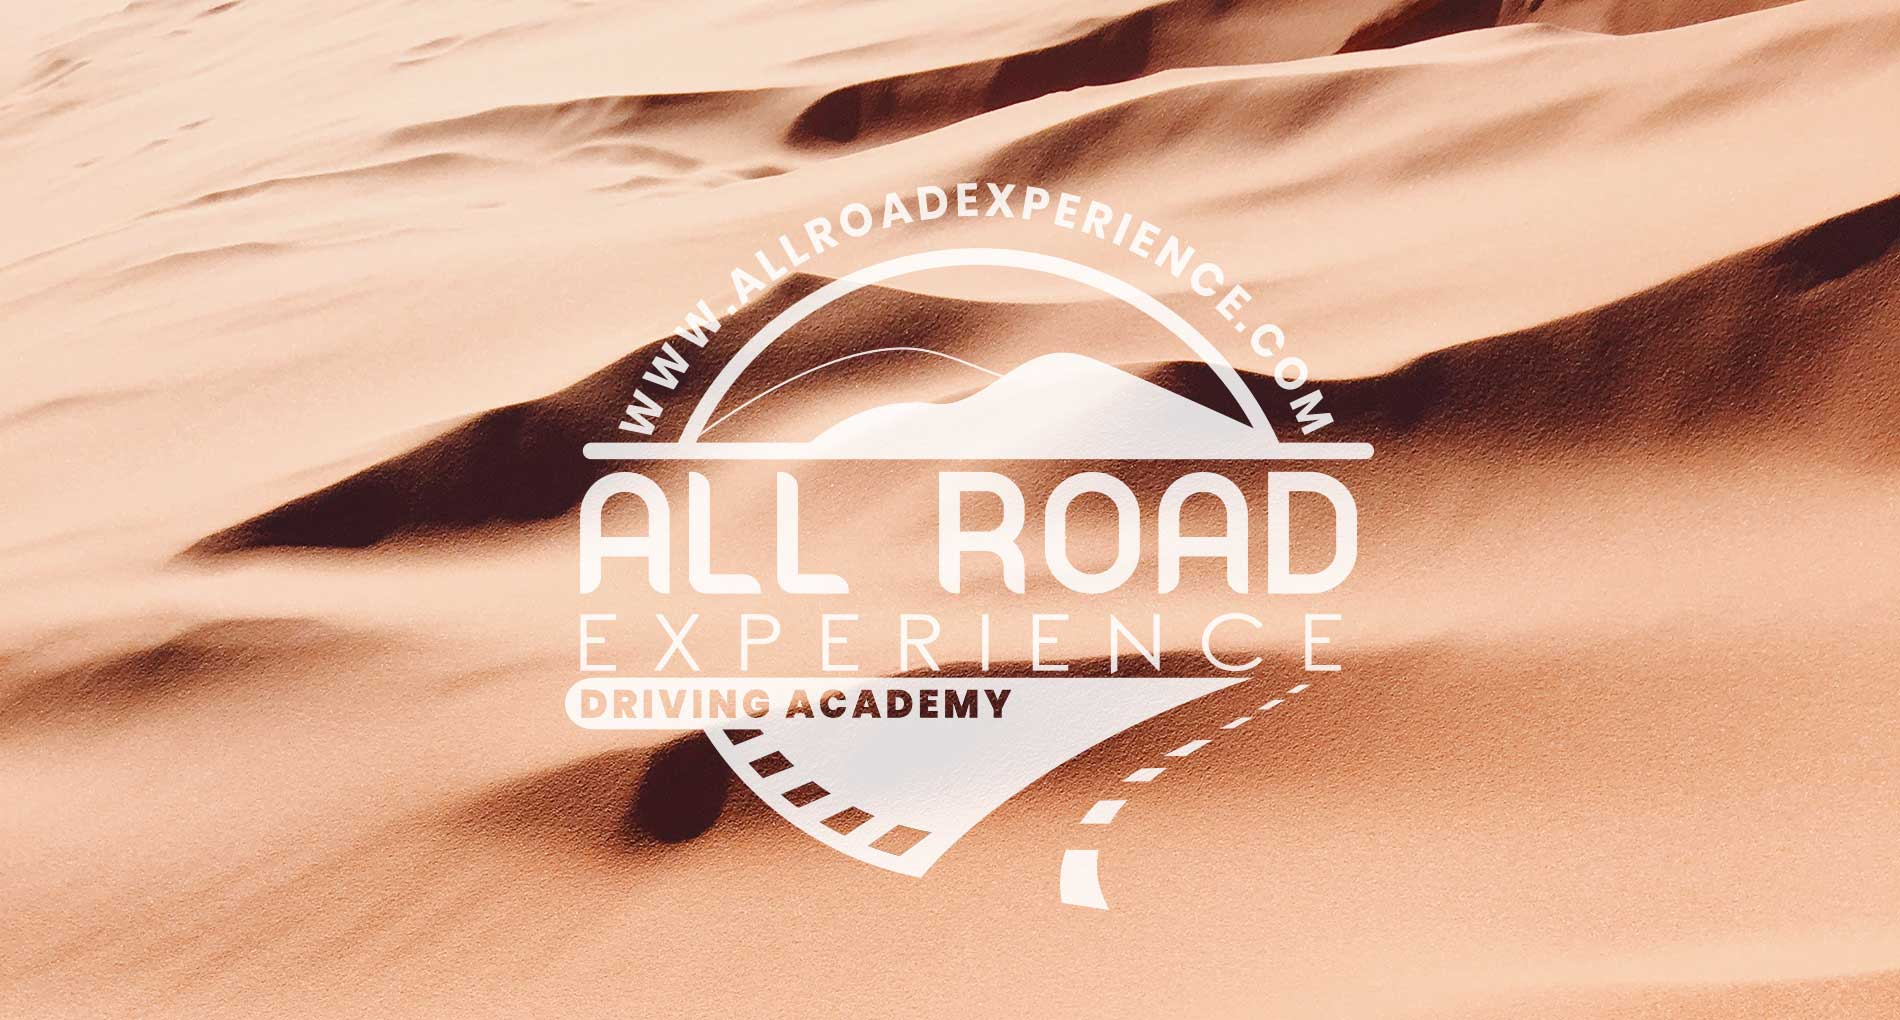 desert-trip-voyage-logo-allroadexperience-ralley-academy-conduite-4x4